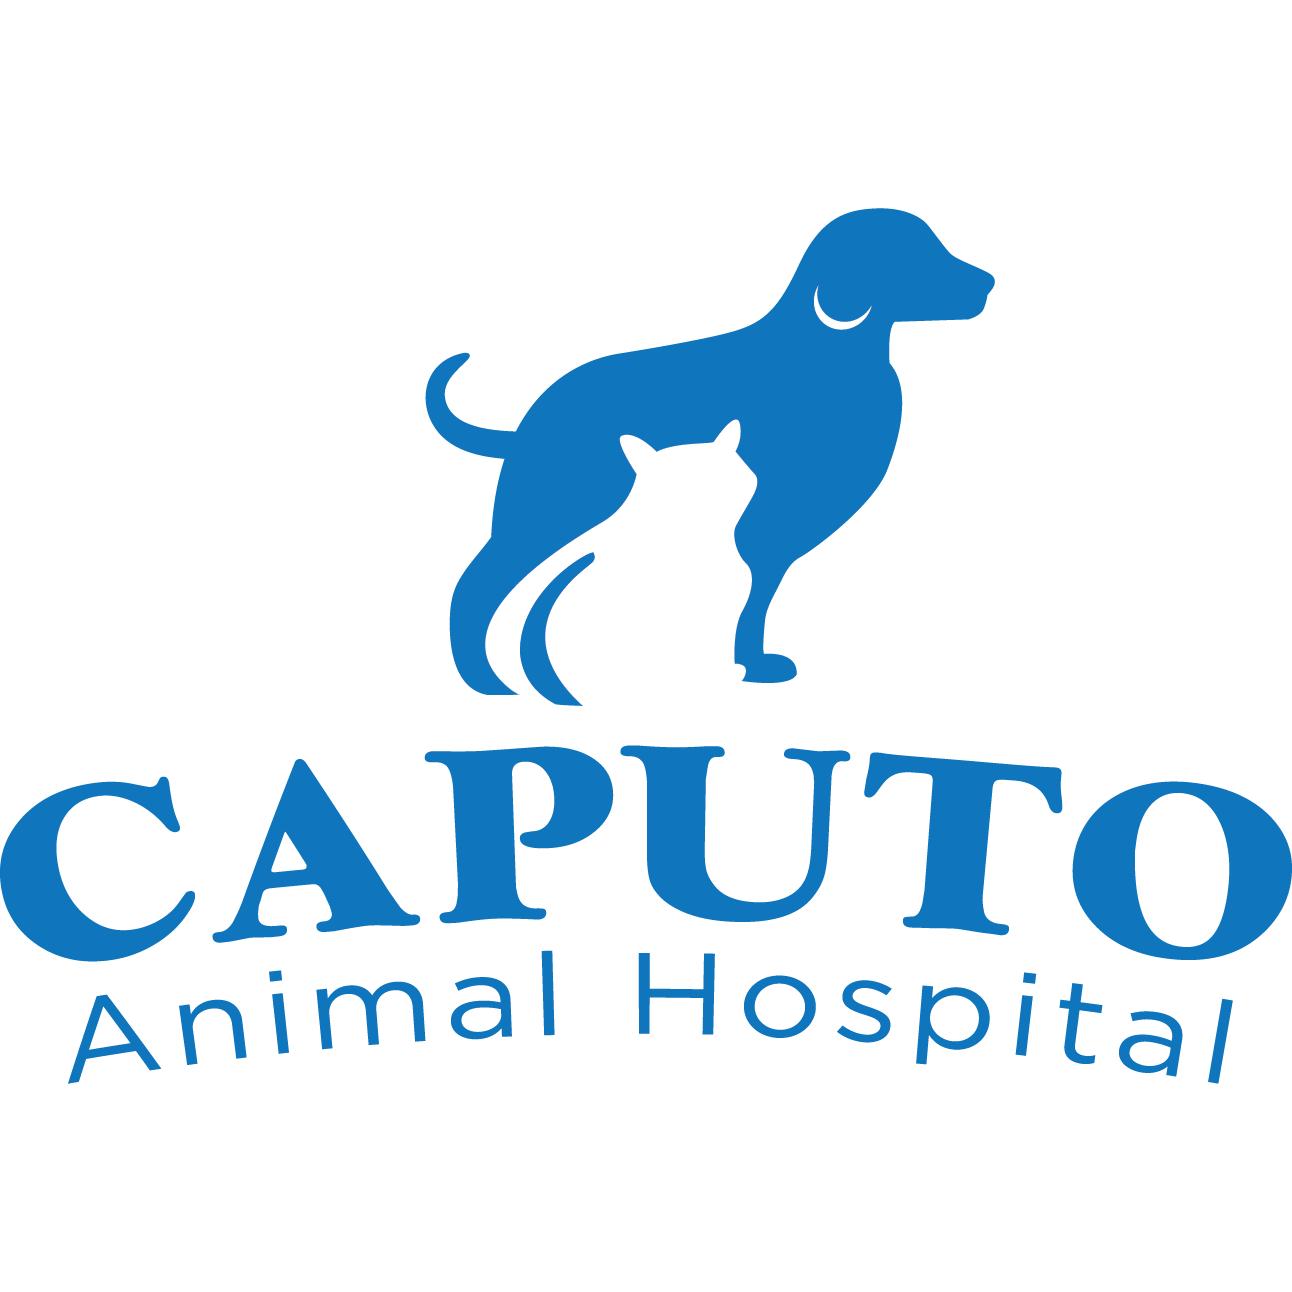 Caputo Animal Hospital